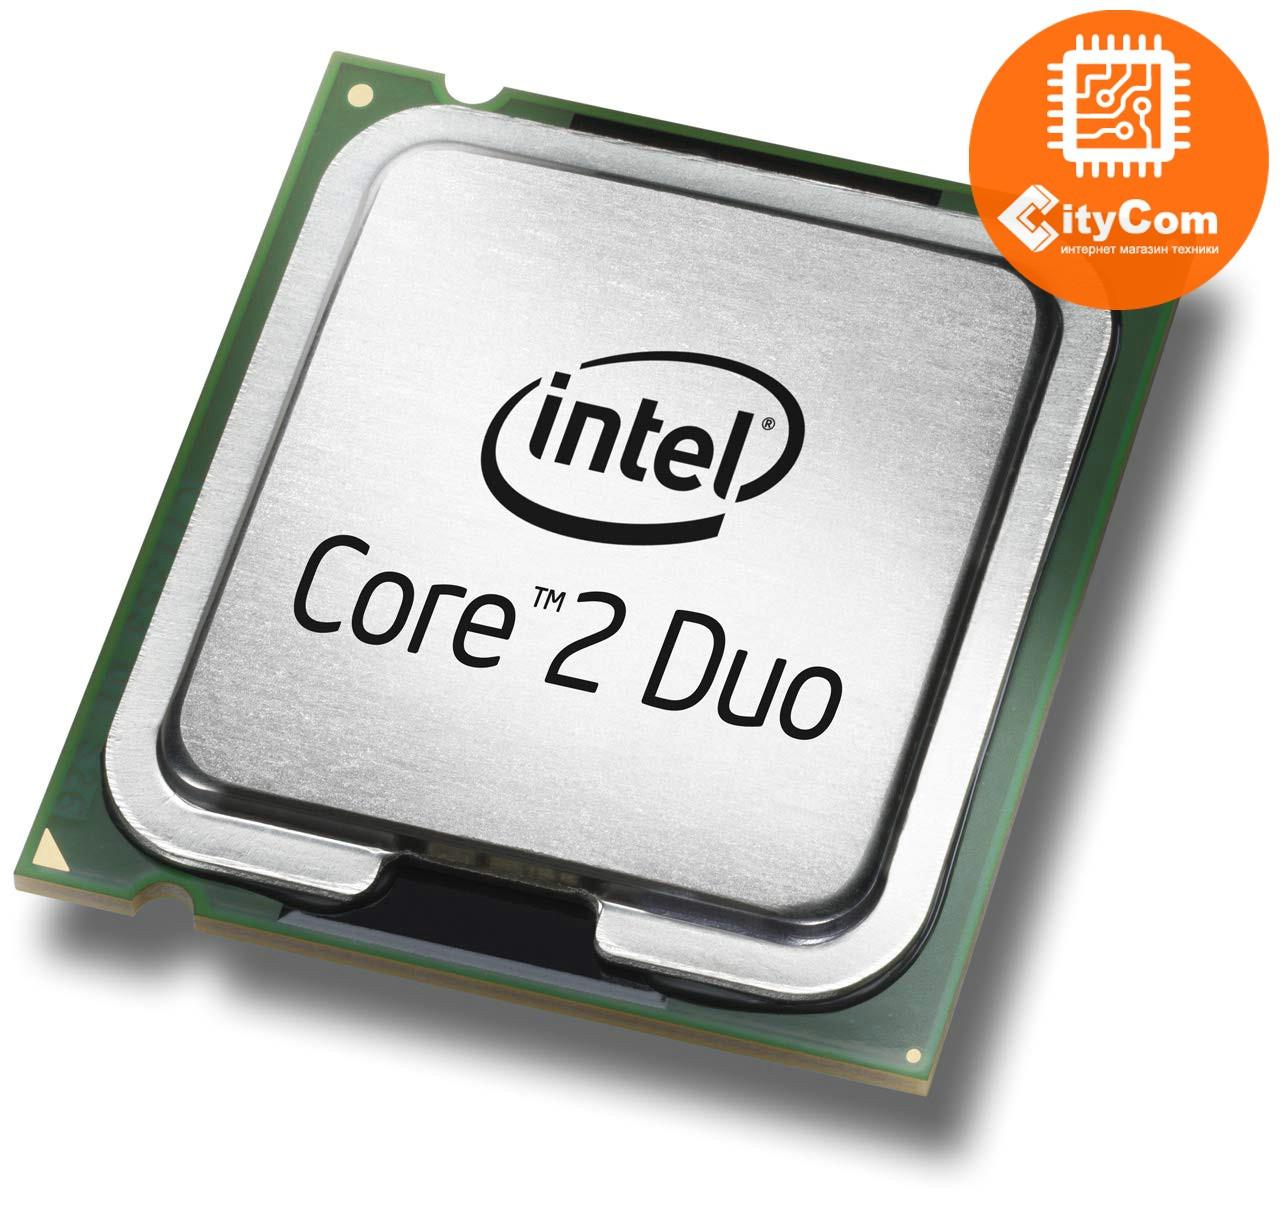 CPU S-775 Intel Core2Duo E6300 1.86 GHz